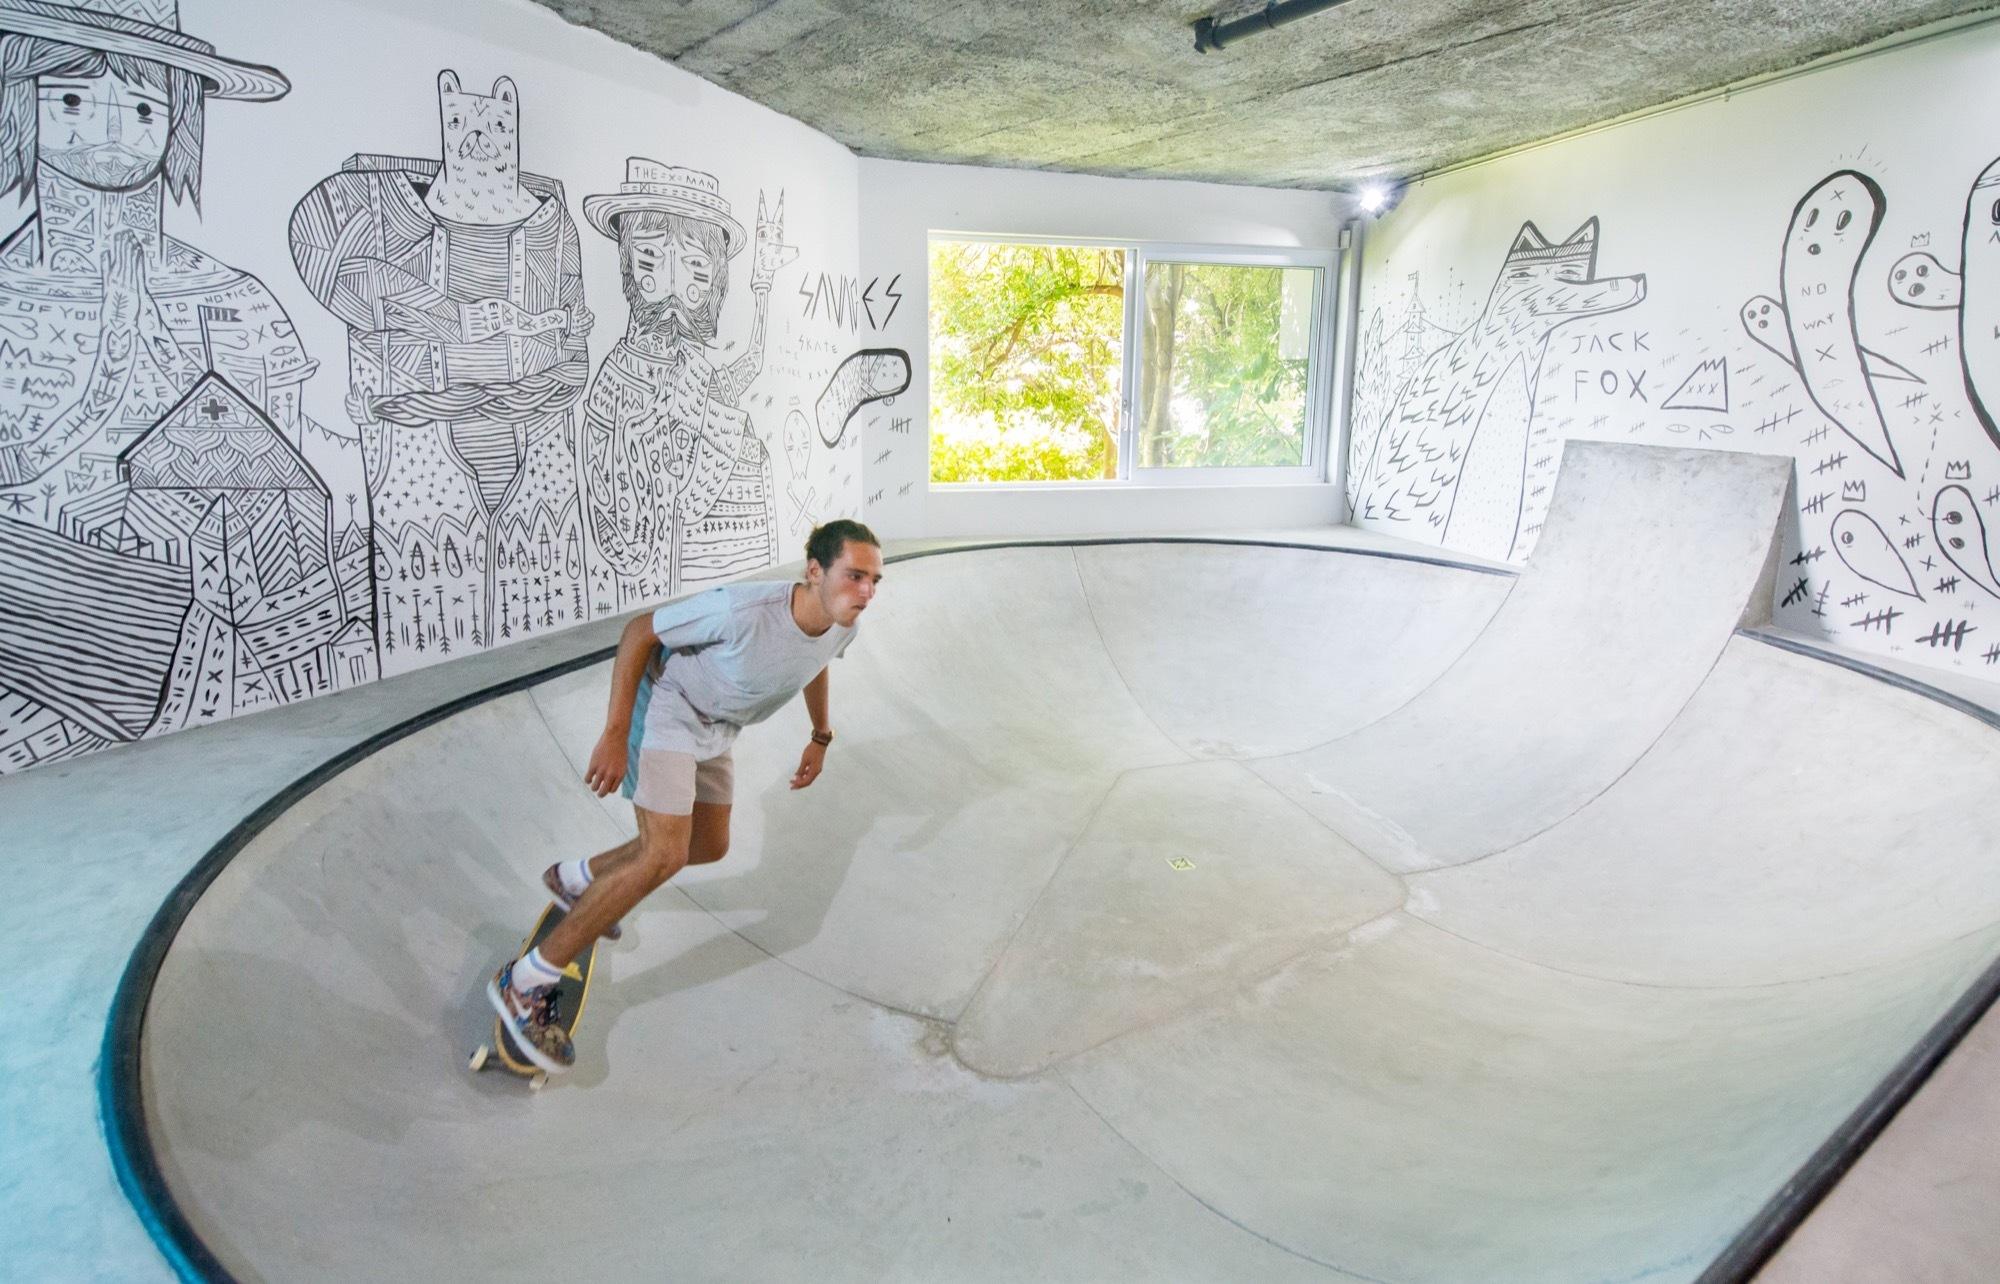 Man Cave Urban : Gallery of urban man cave inhouse brand architects